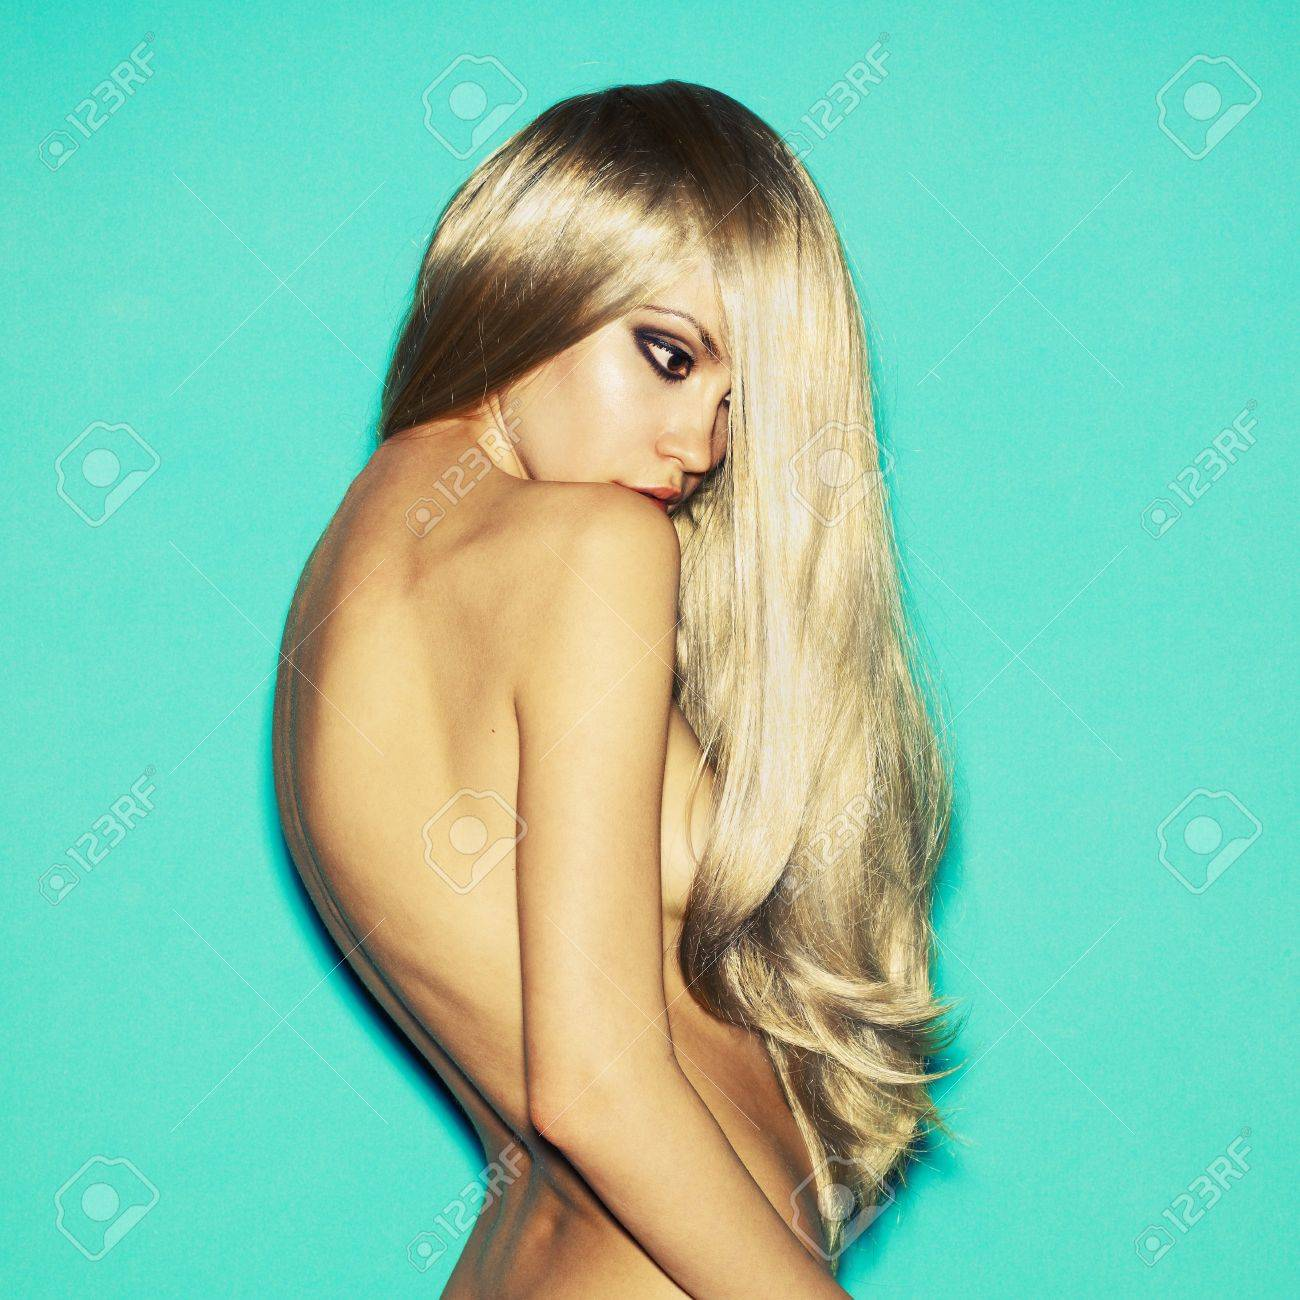 Naked lady hair, bikinis boobs video